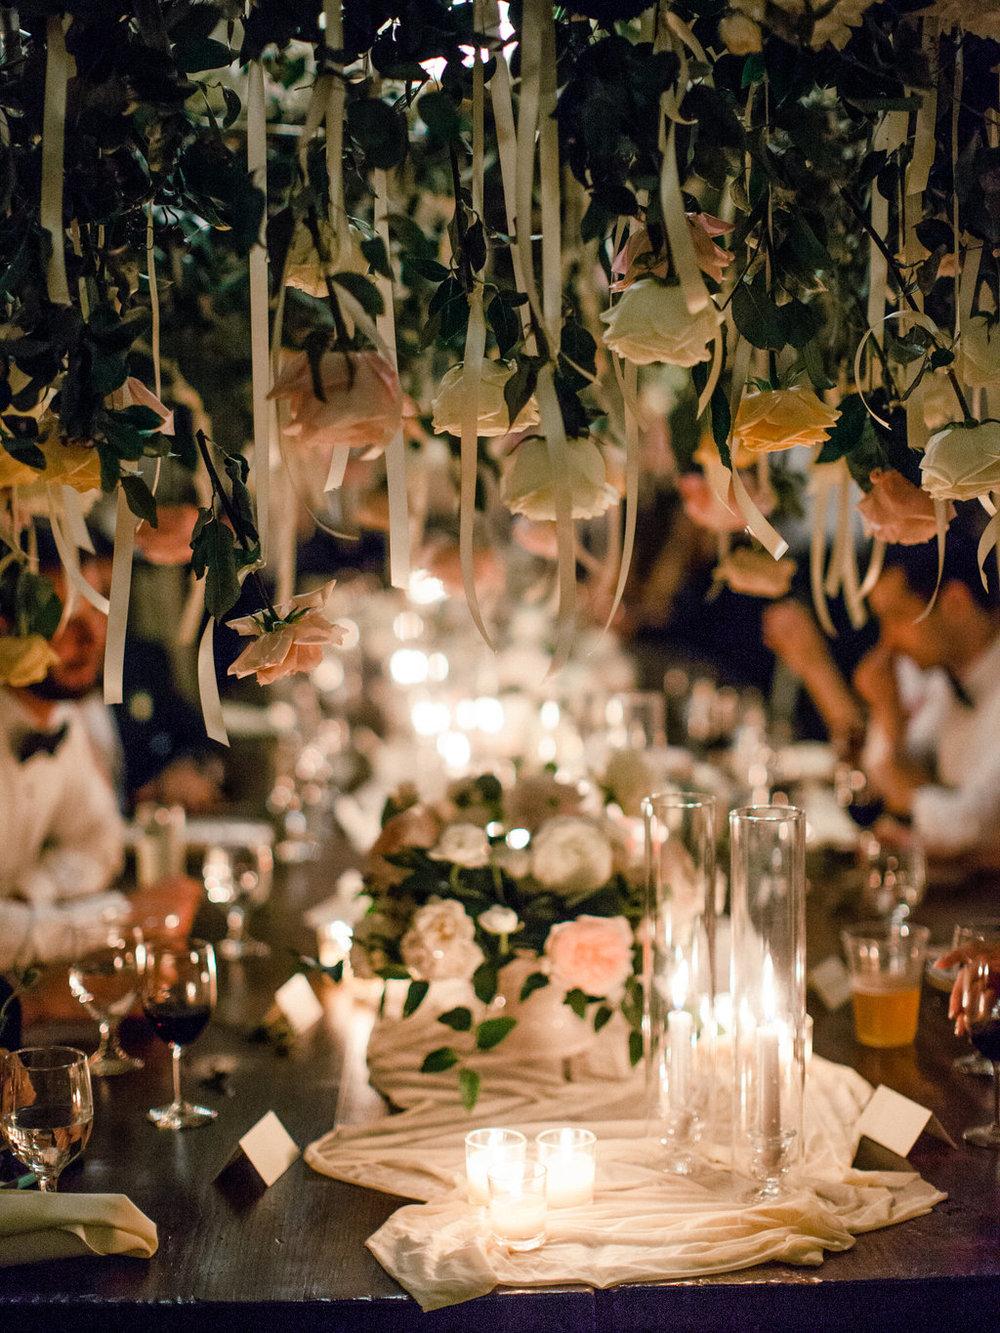 Houston_Events_Wedding_Texas_Maxit.jpg